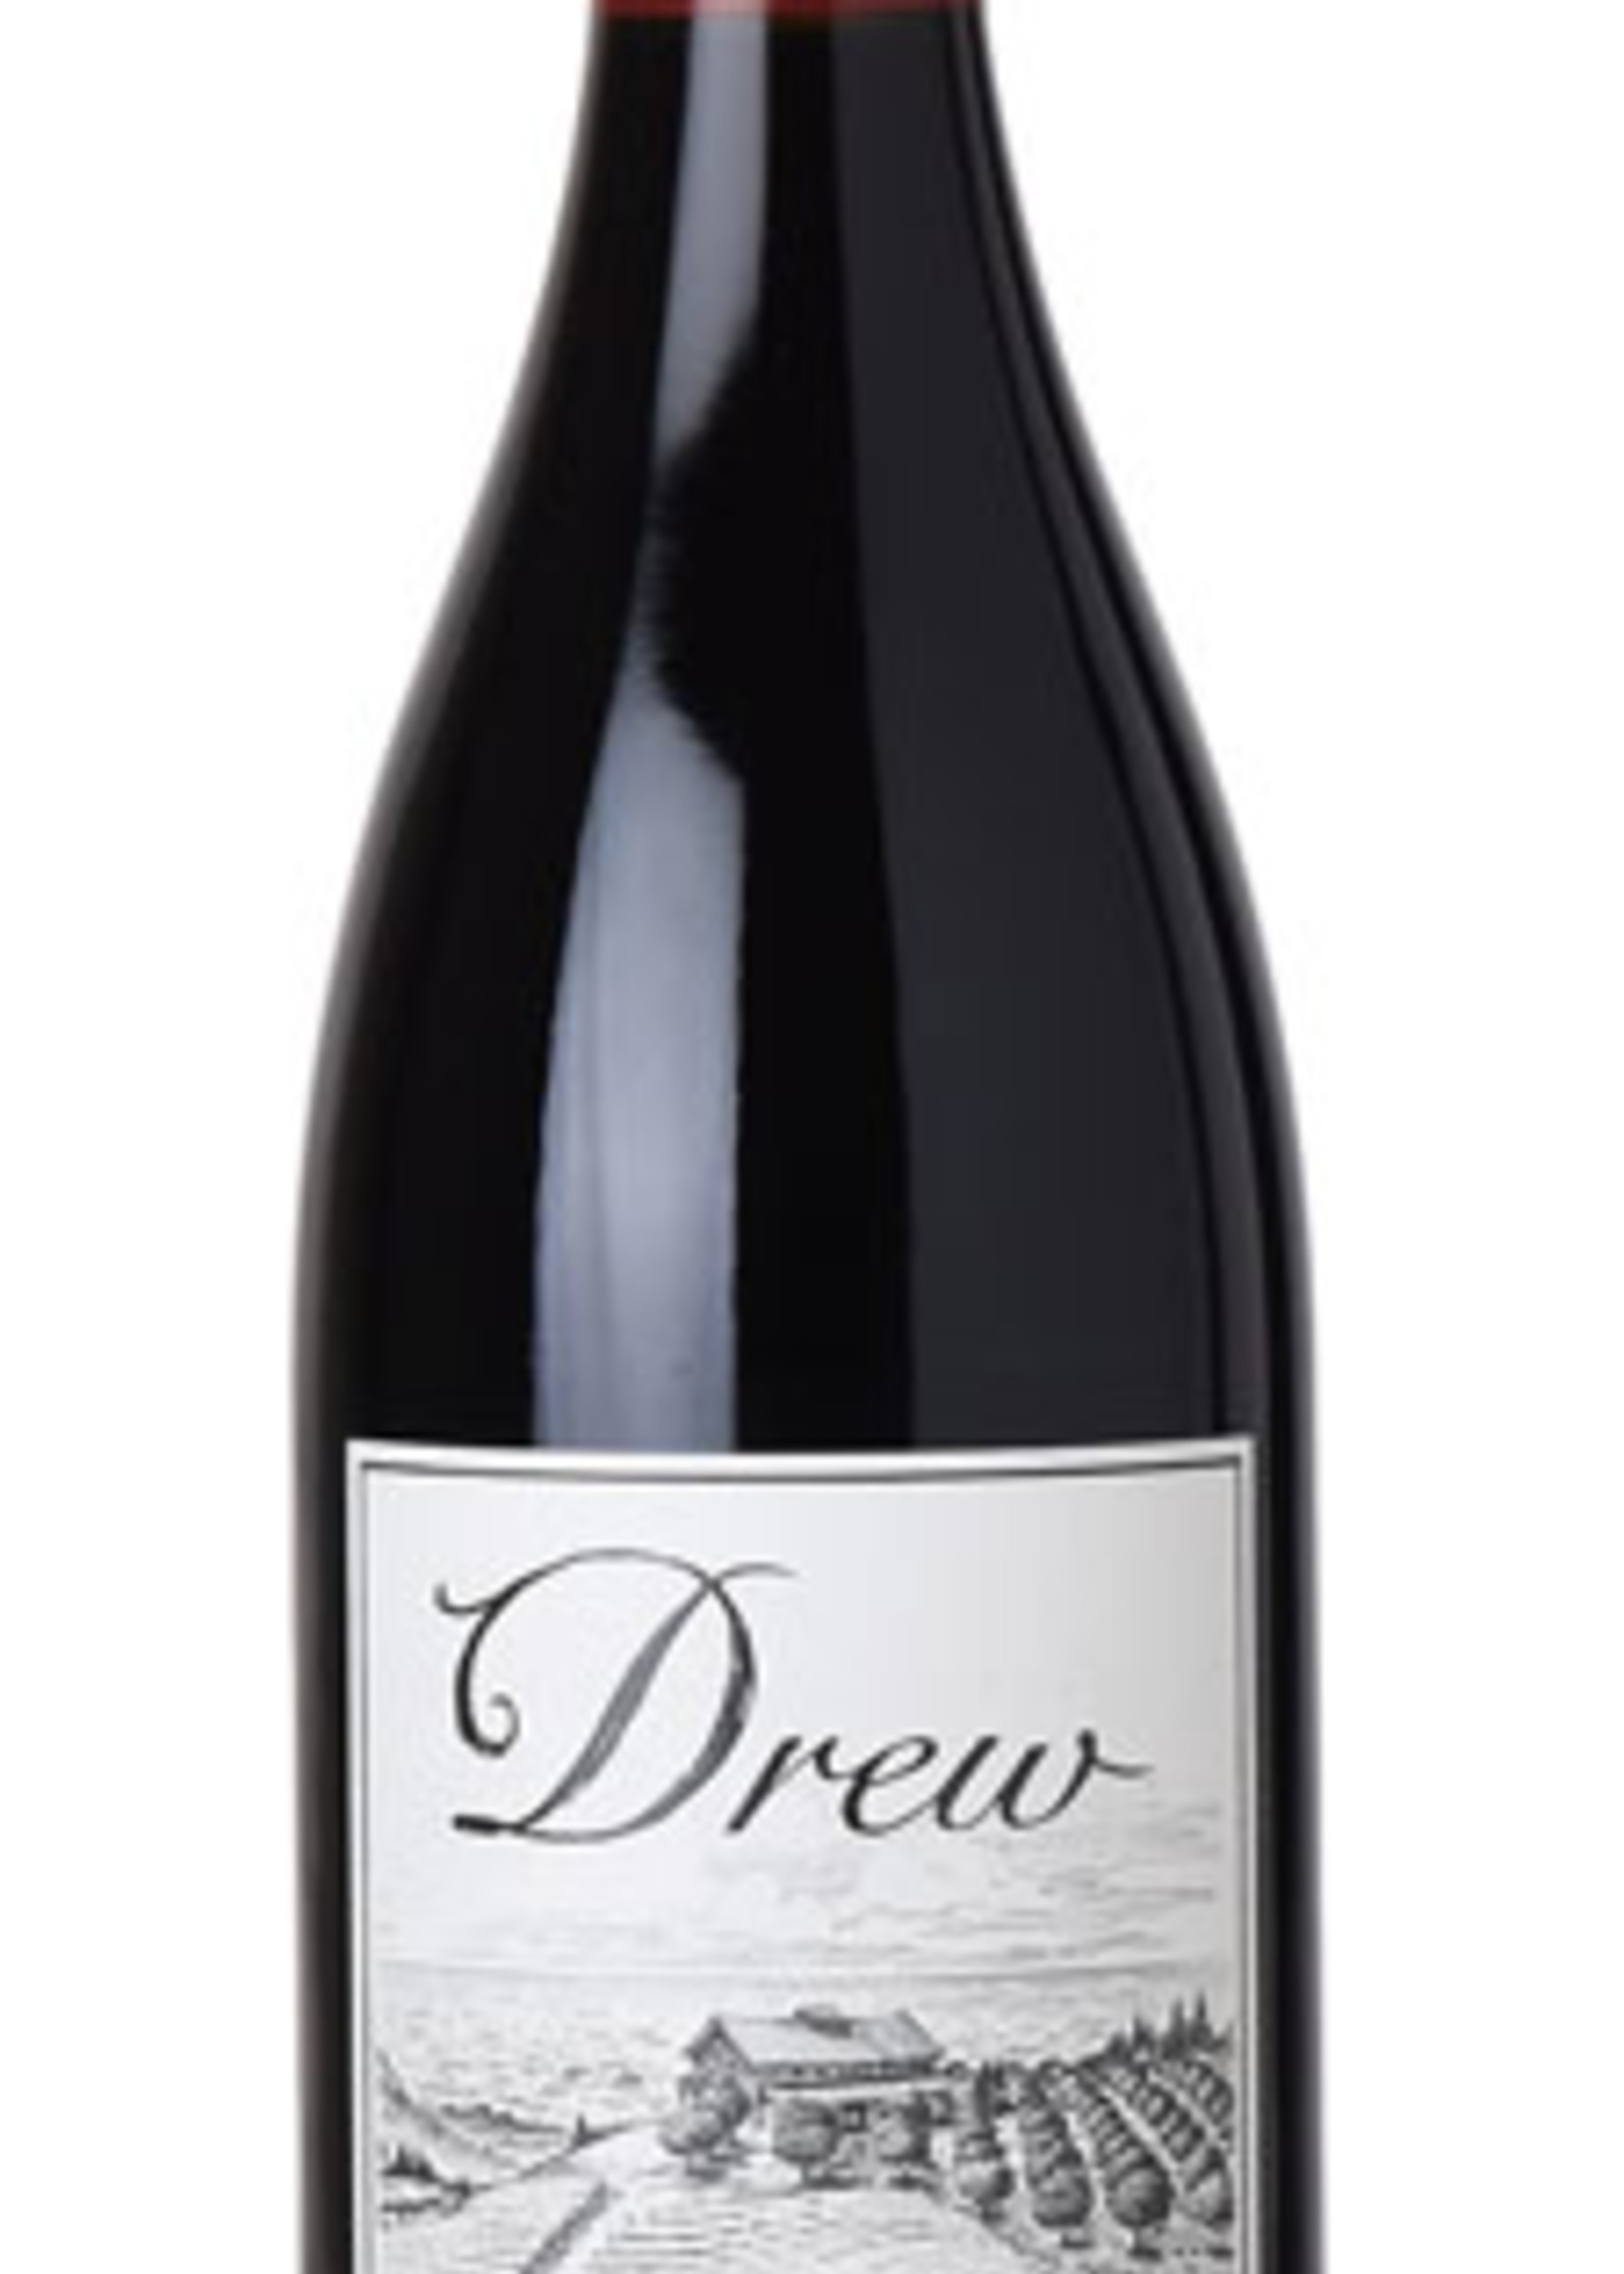 Drew Family Cellars Suitcase Pinot Noir